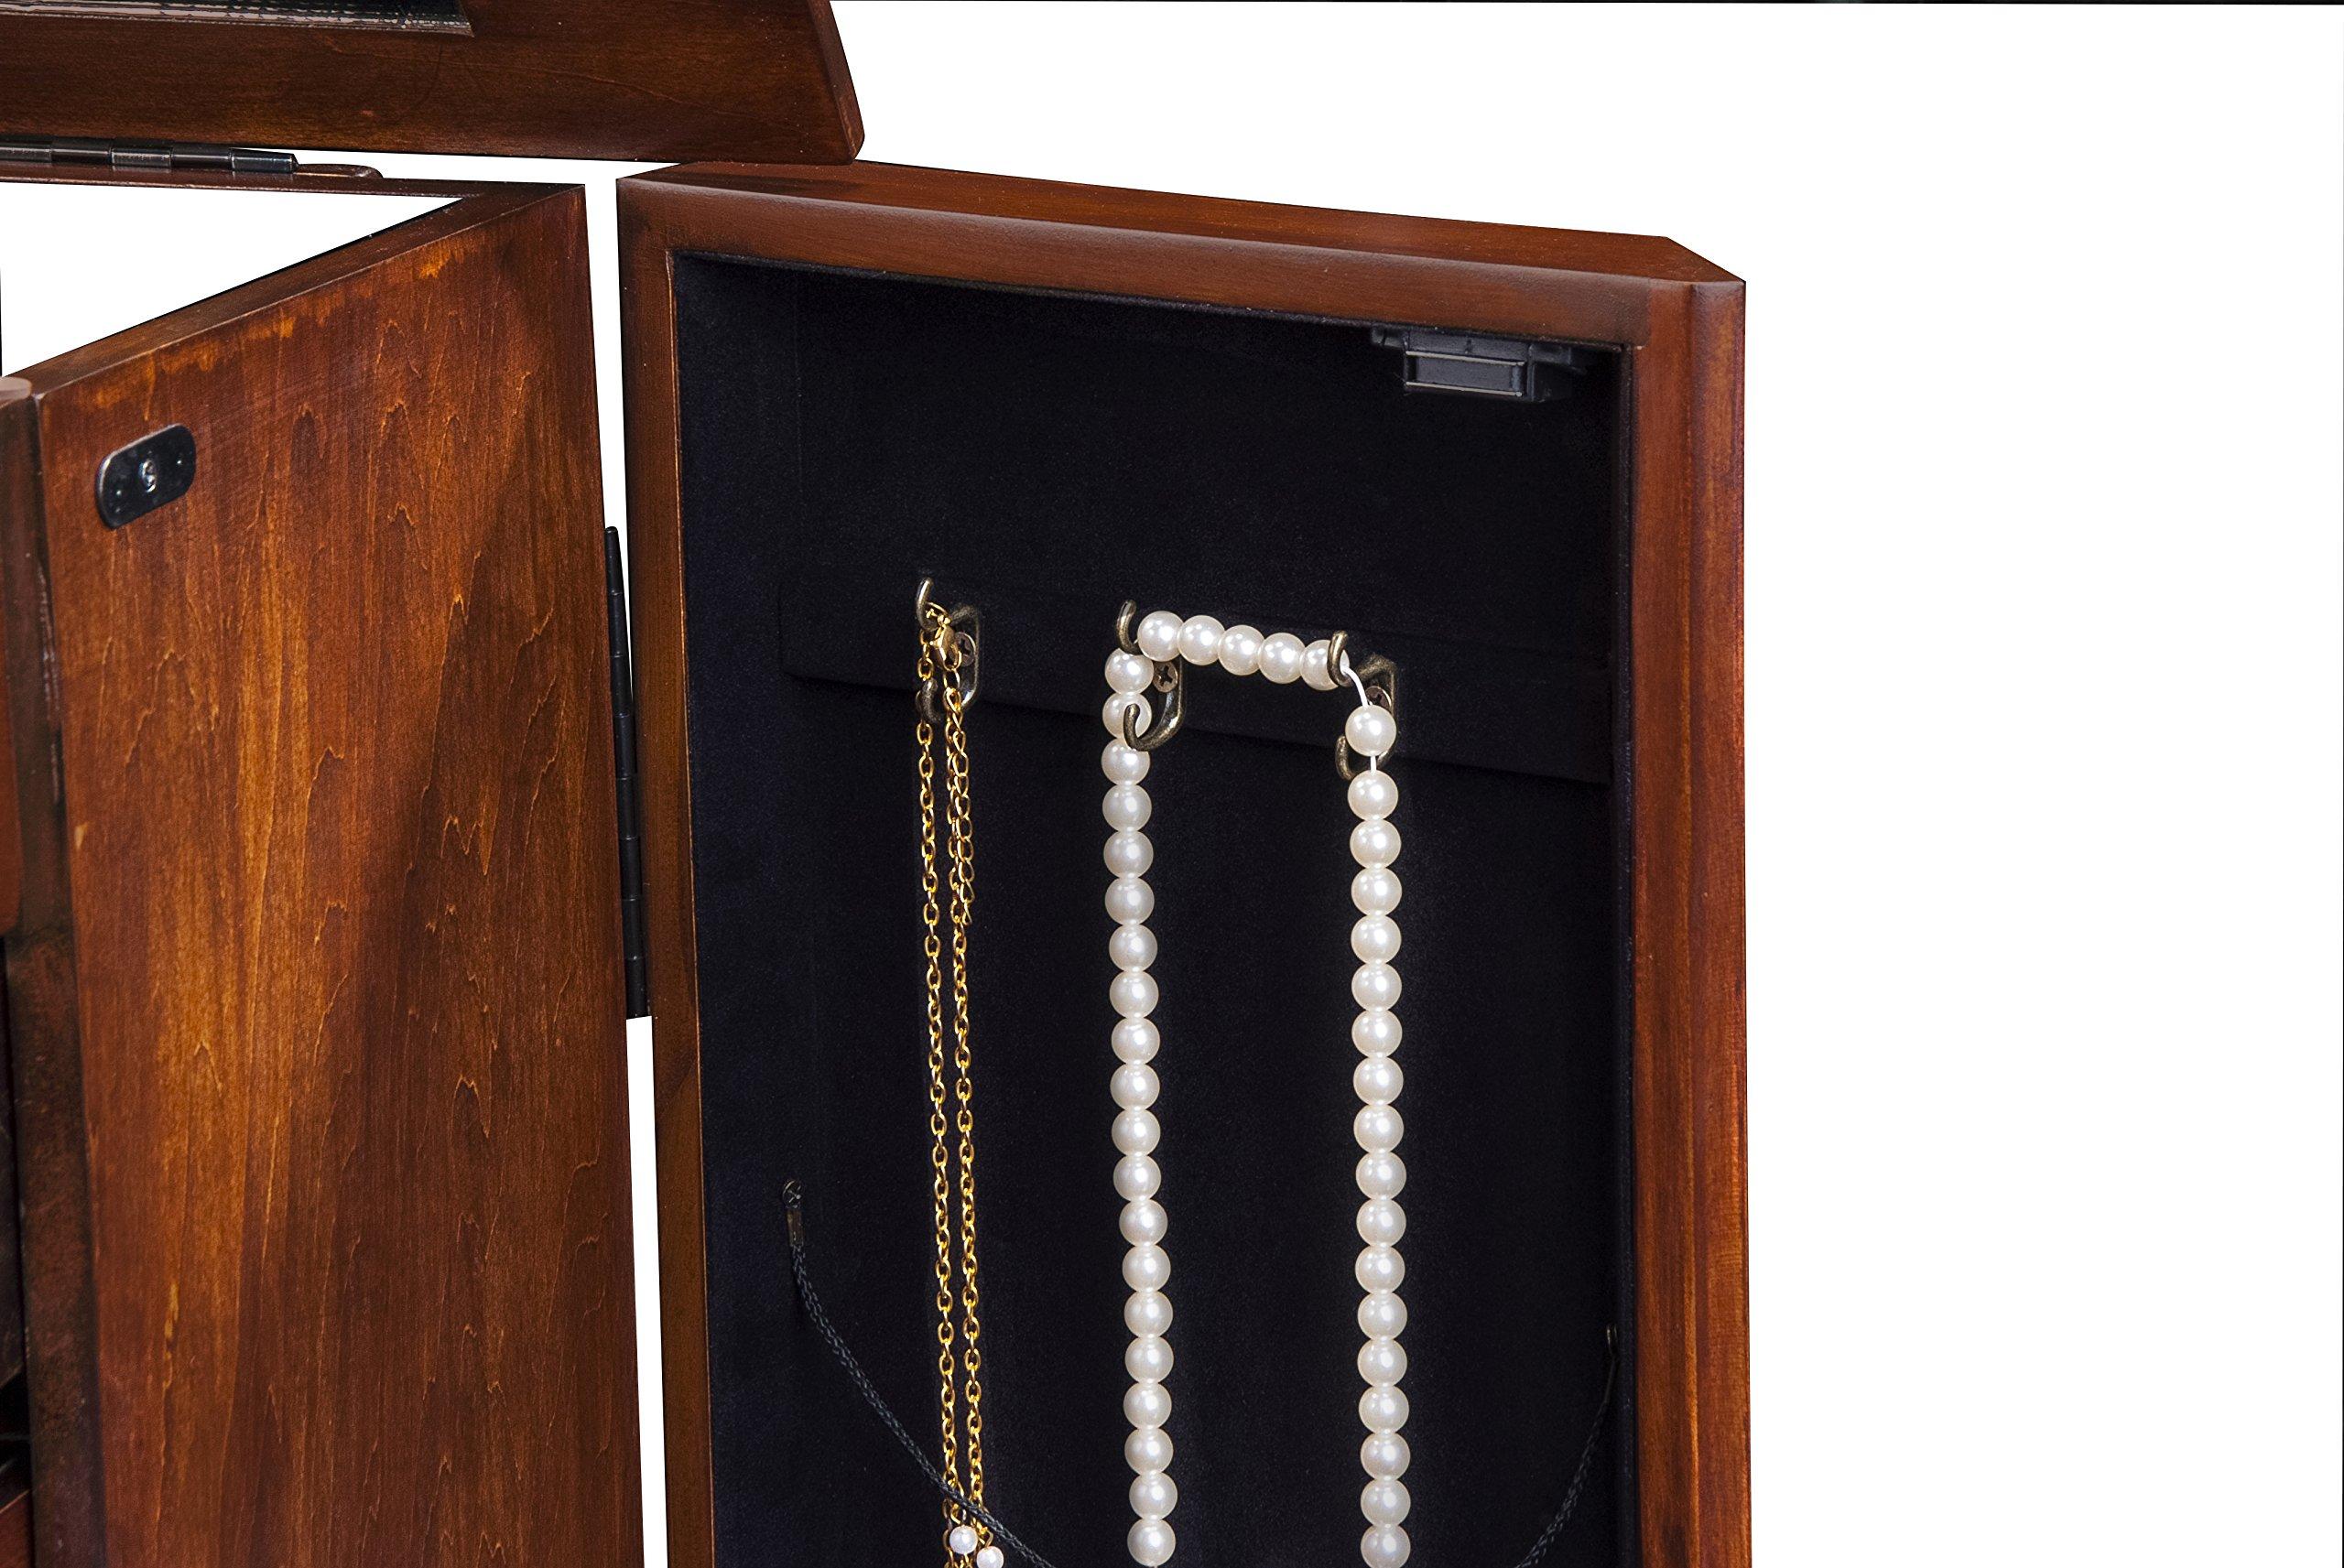 CTE 5 Drawers Jewelry Armoire - Coffee